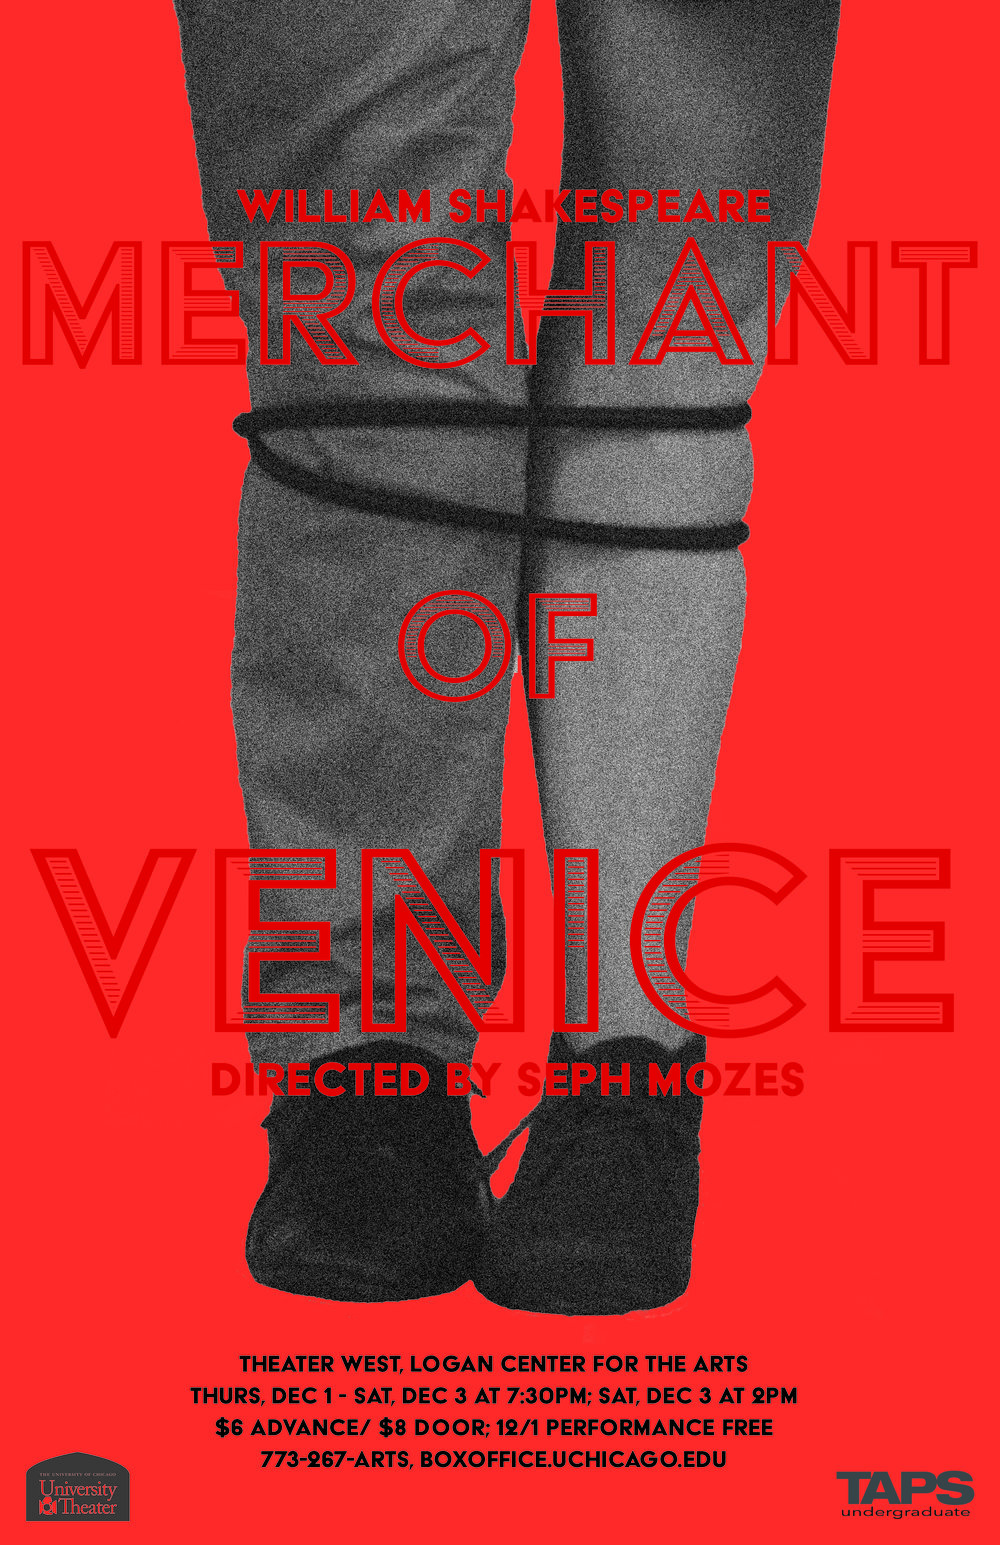 merchant2.jpg